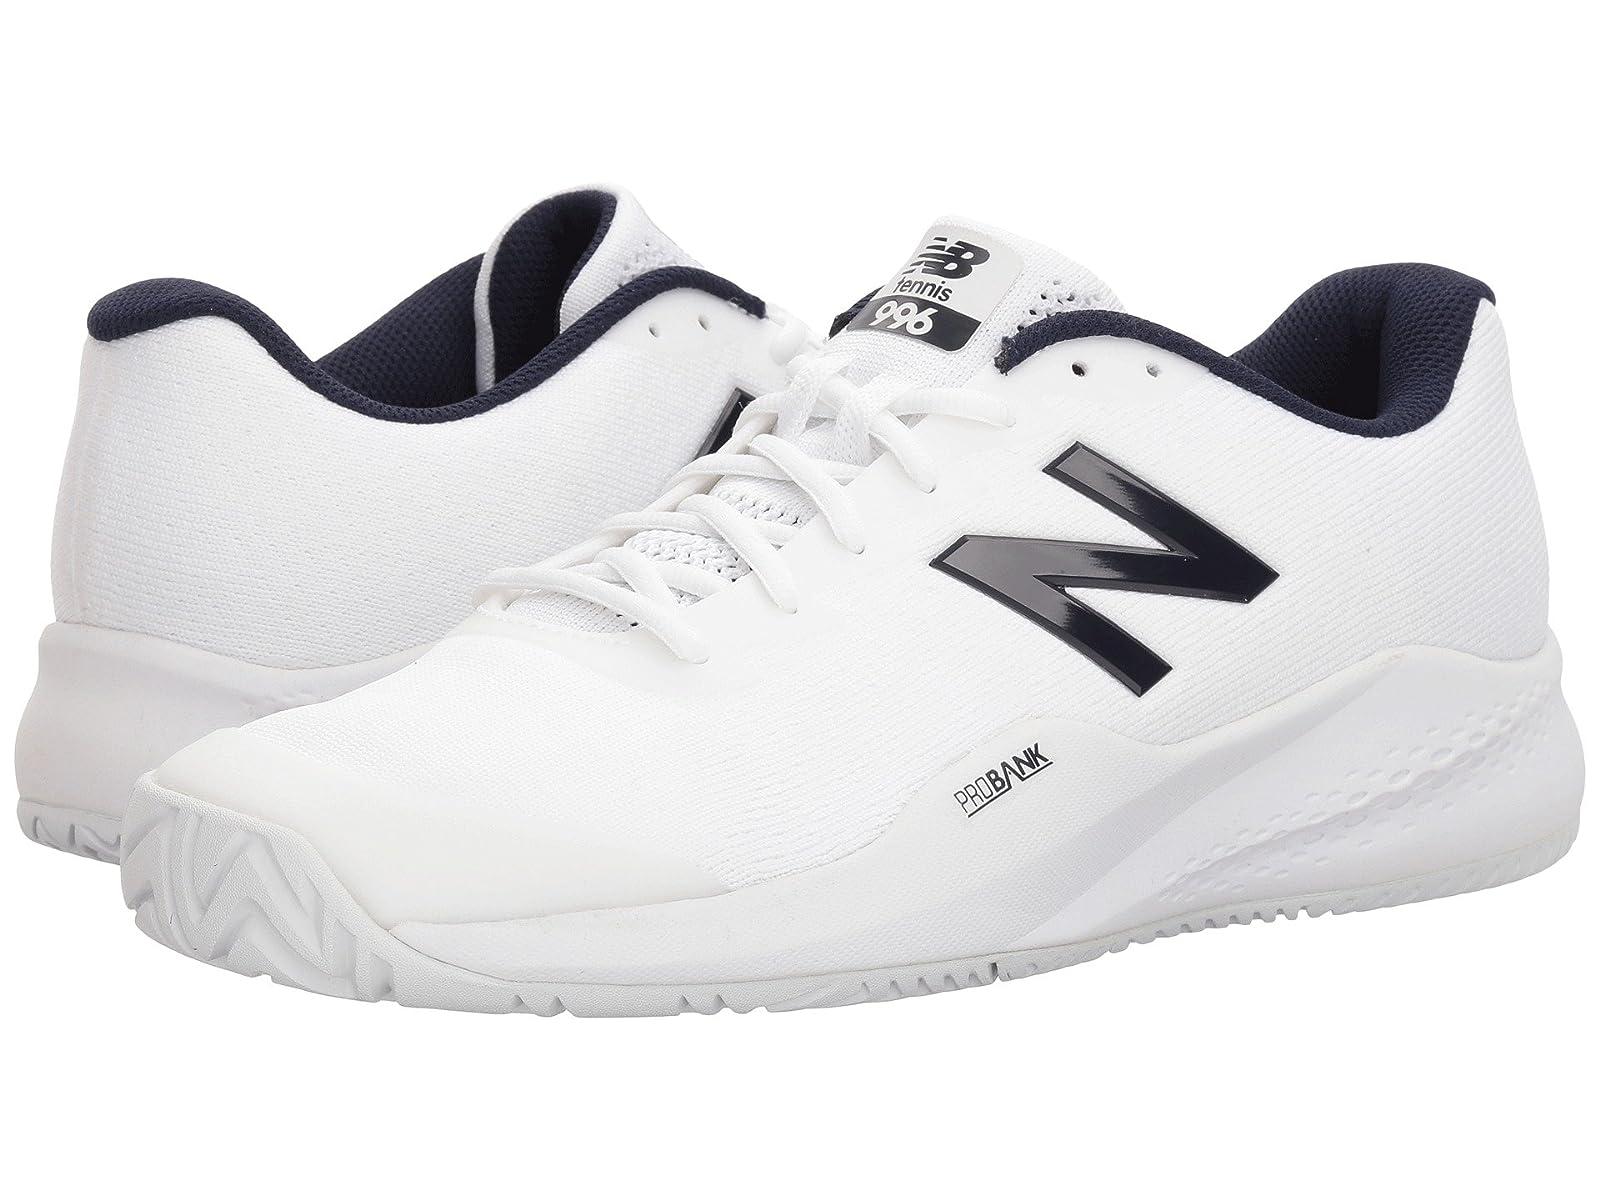 New Balance 996v3Atmospheric grades have affordable shoes